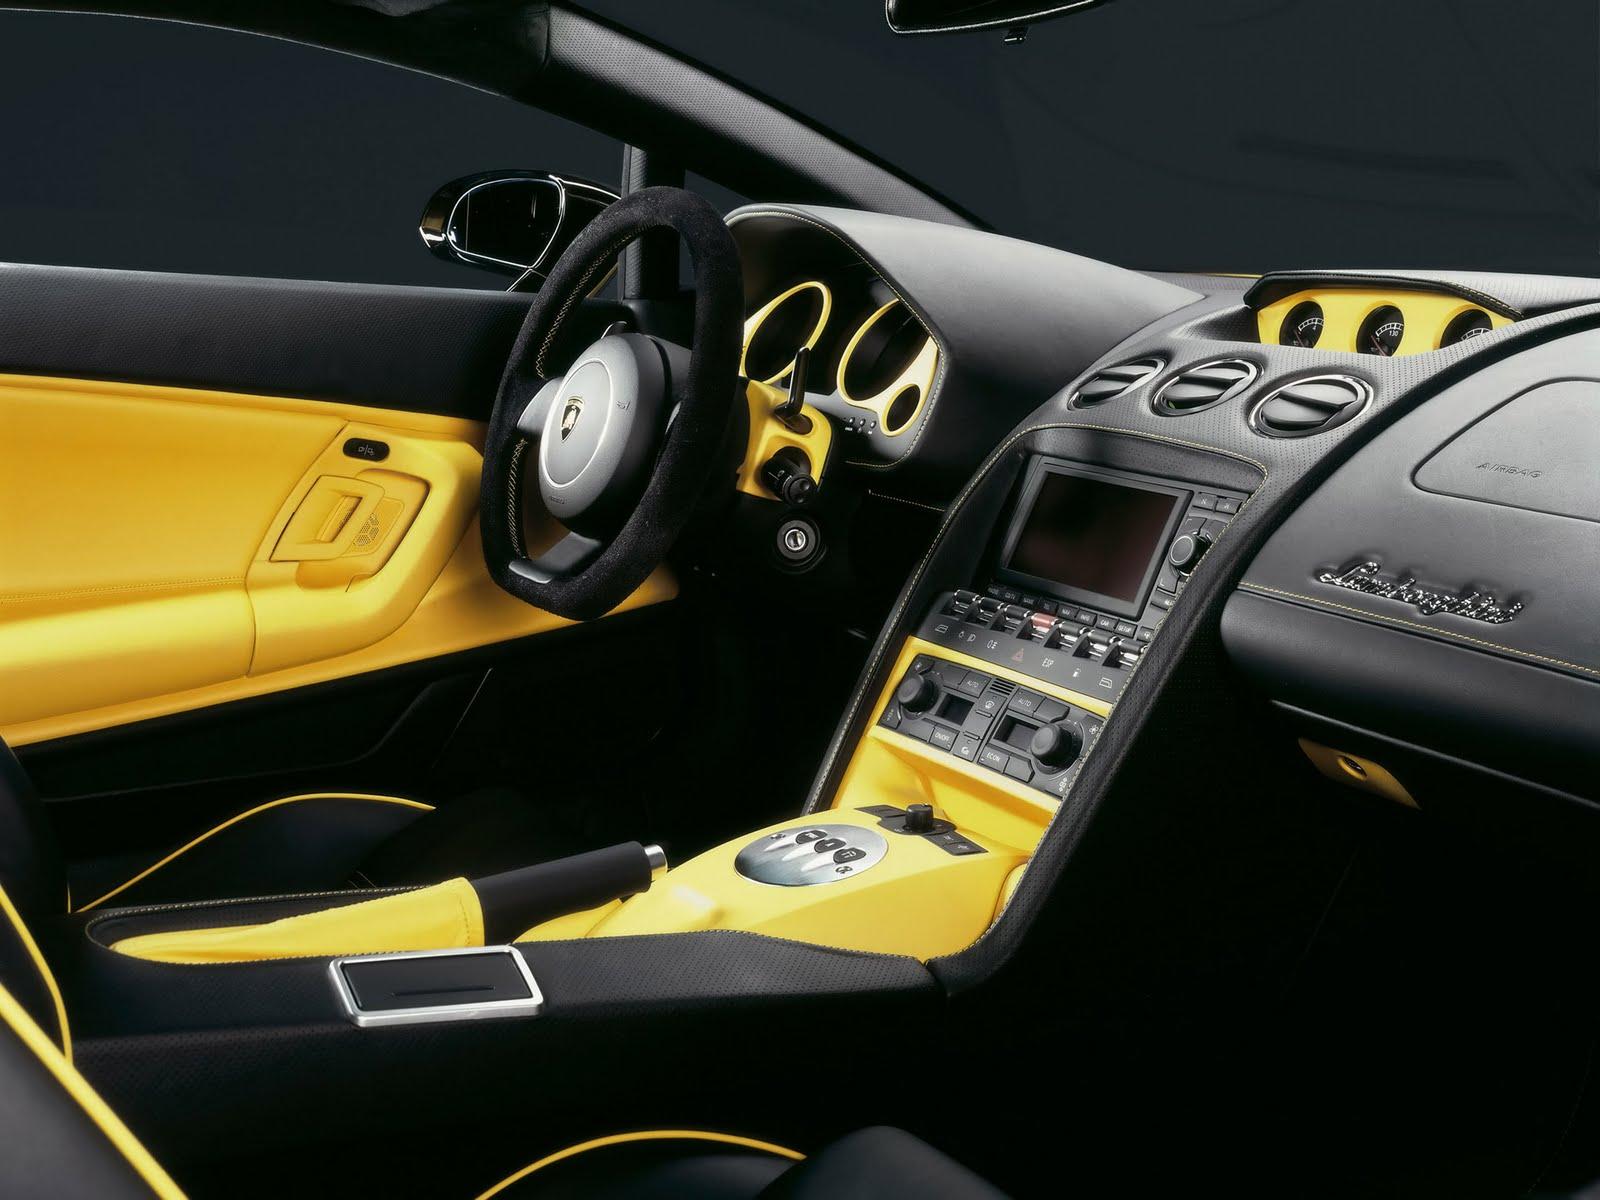 Automotivegeneral 2019 Lamborghini Aventador Interior Wallpapers